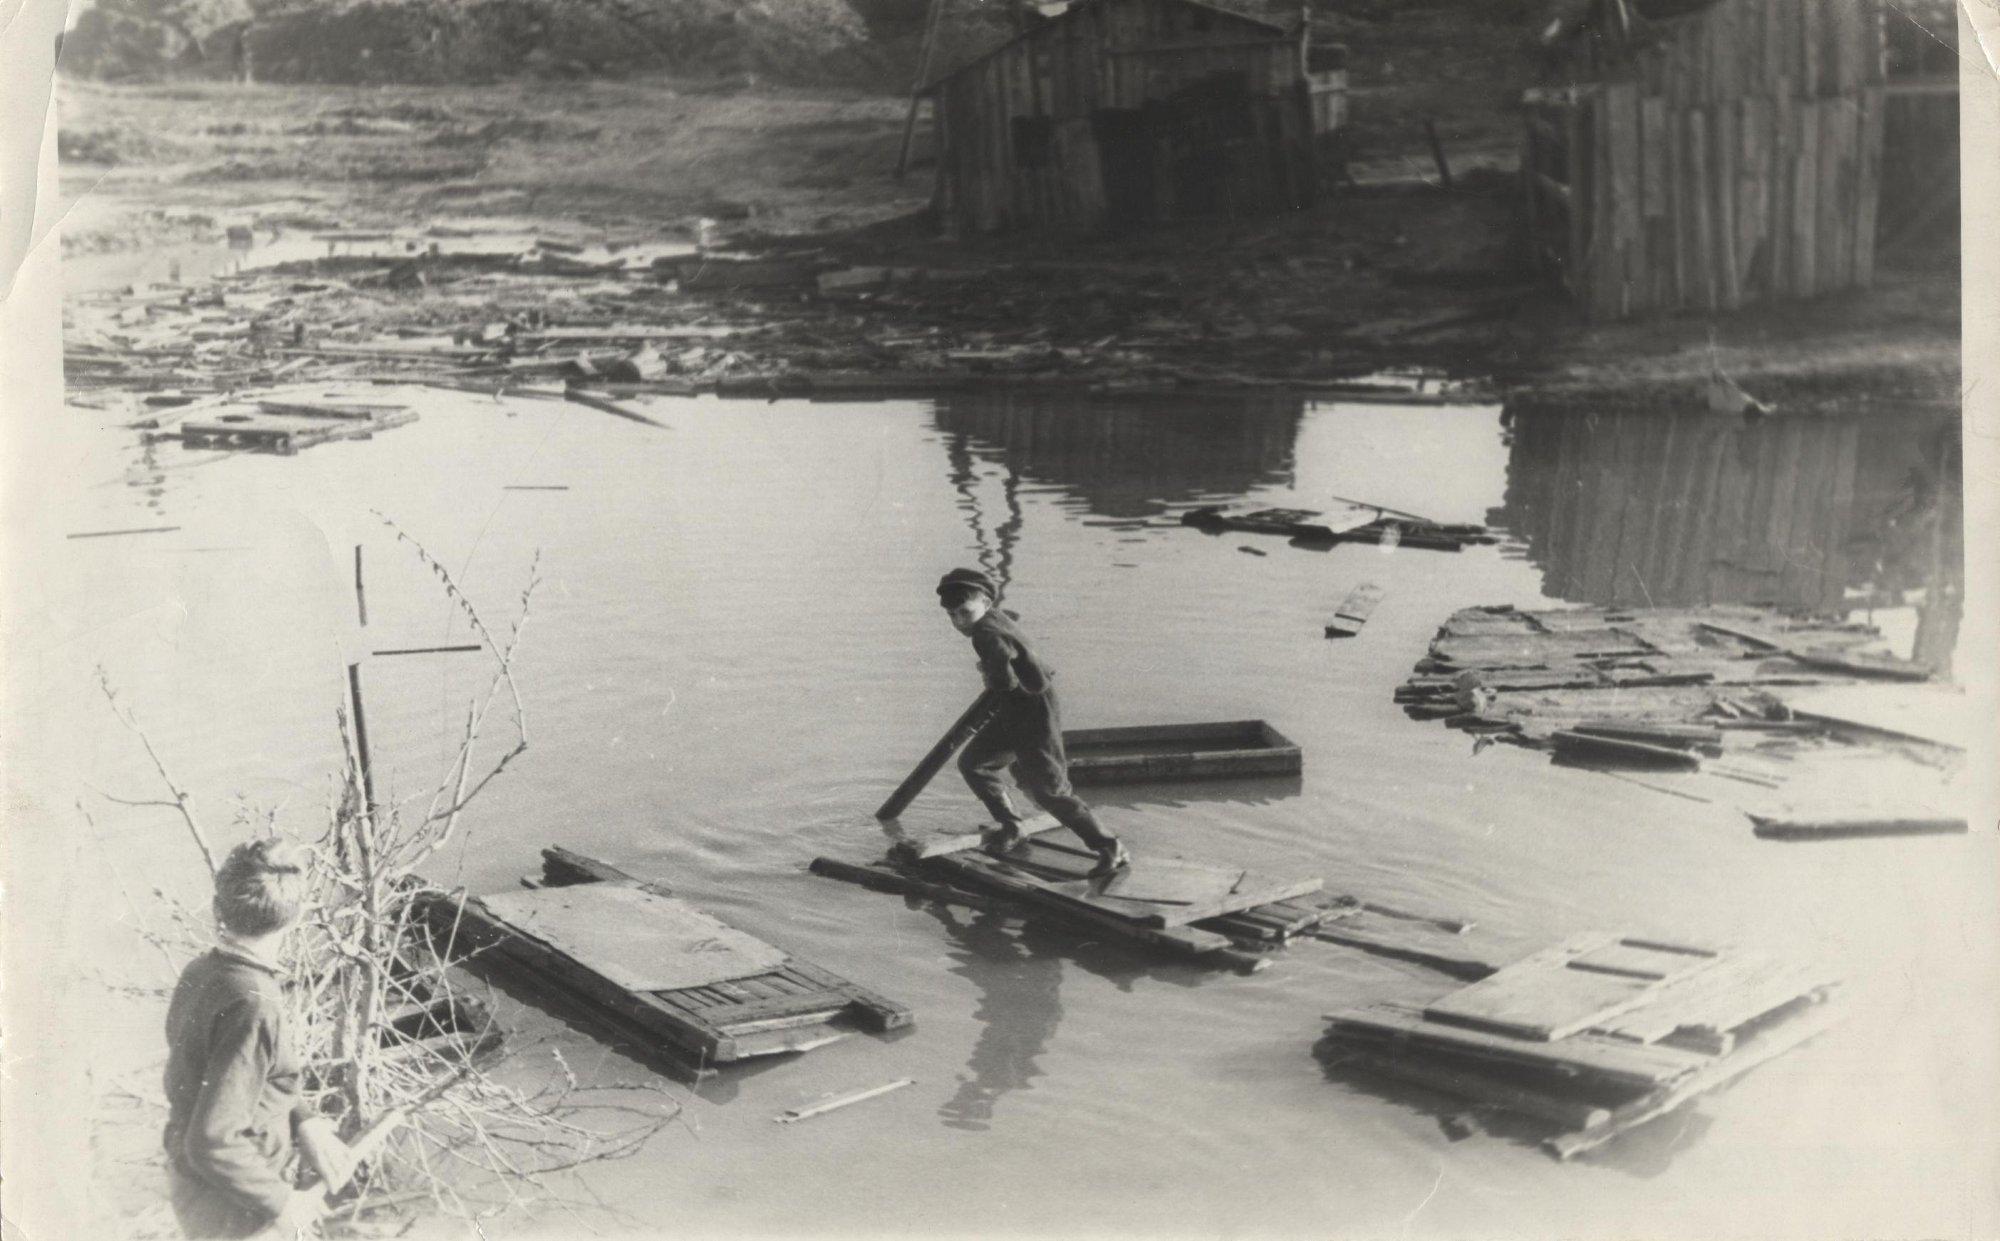 1964. Черёмушки, весна